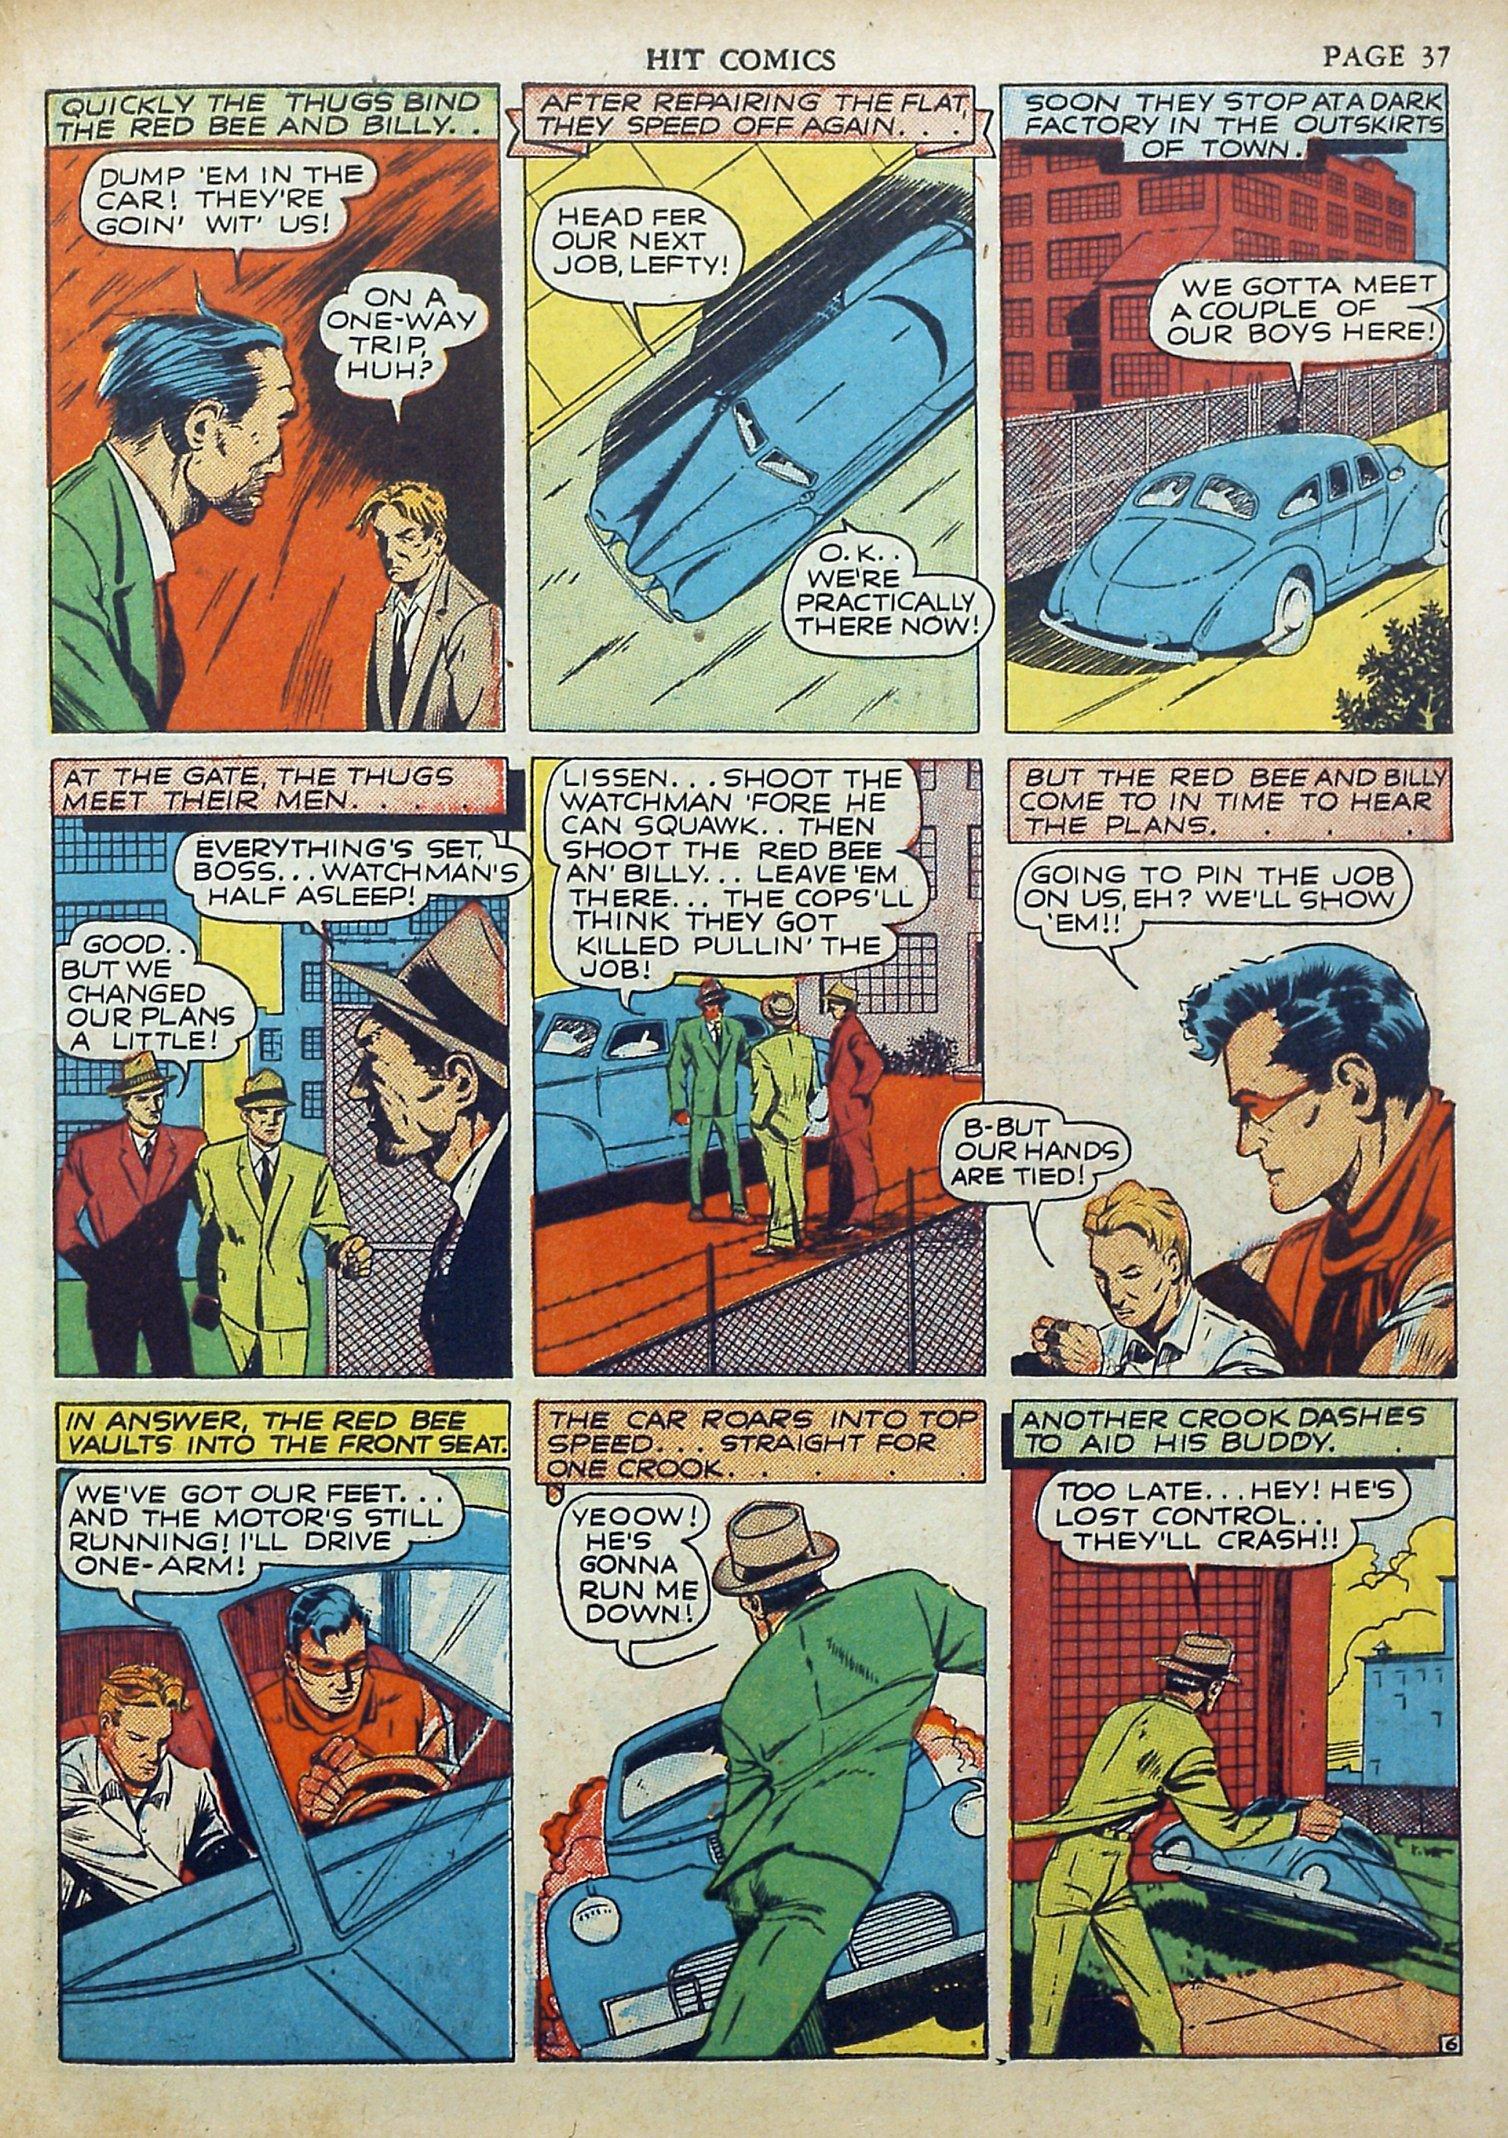 Read online Hit Comics comic -  Issue #17 - 39